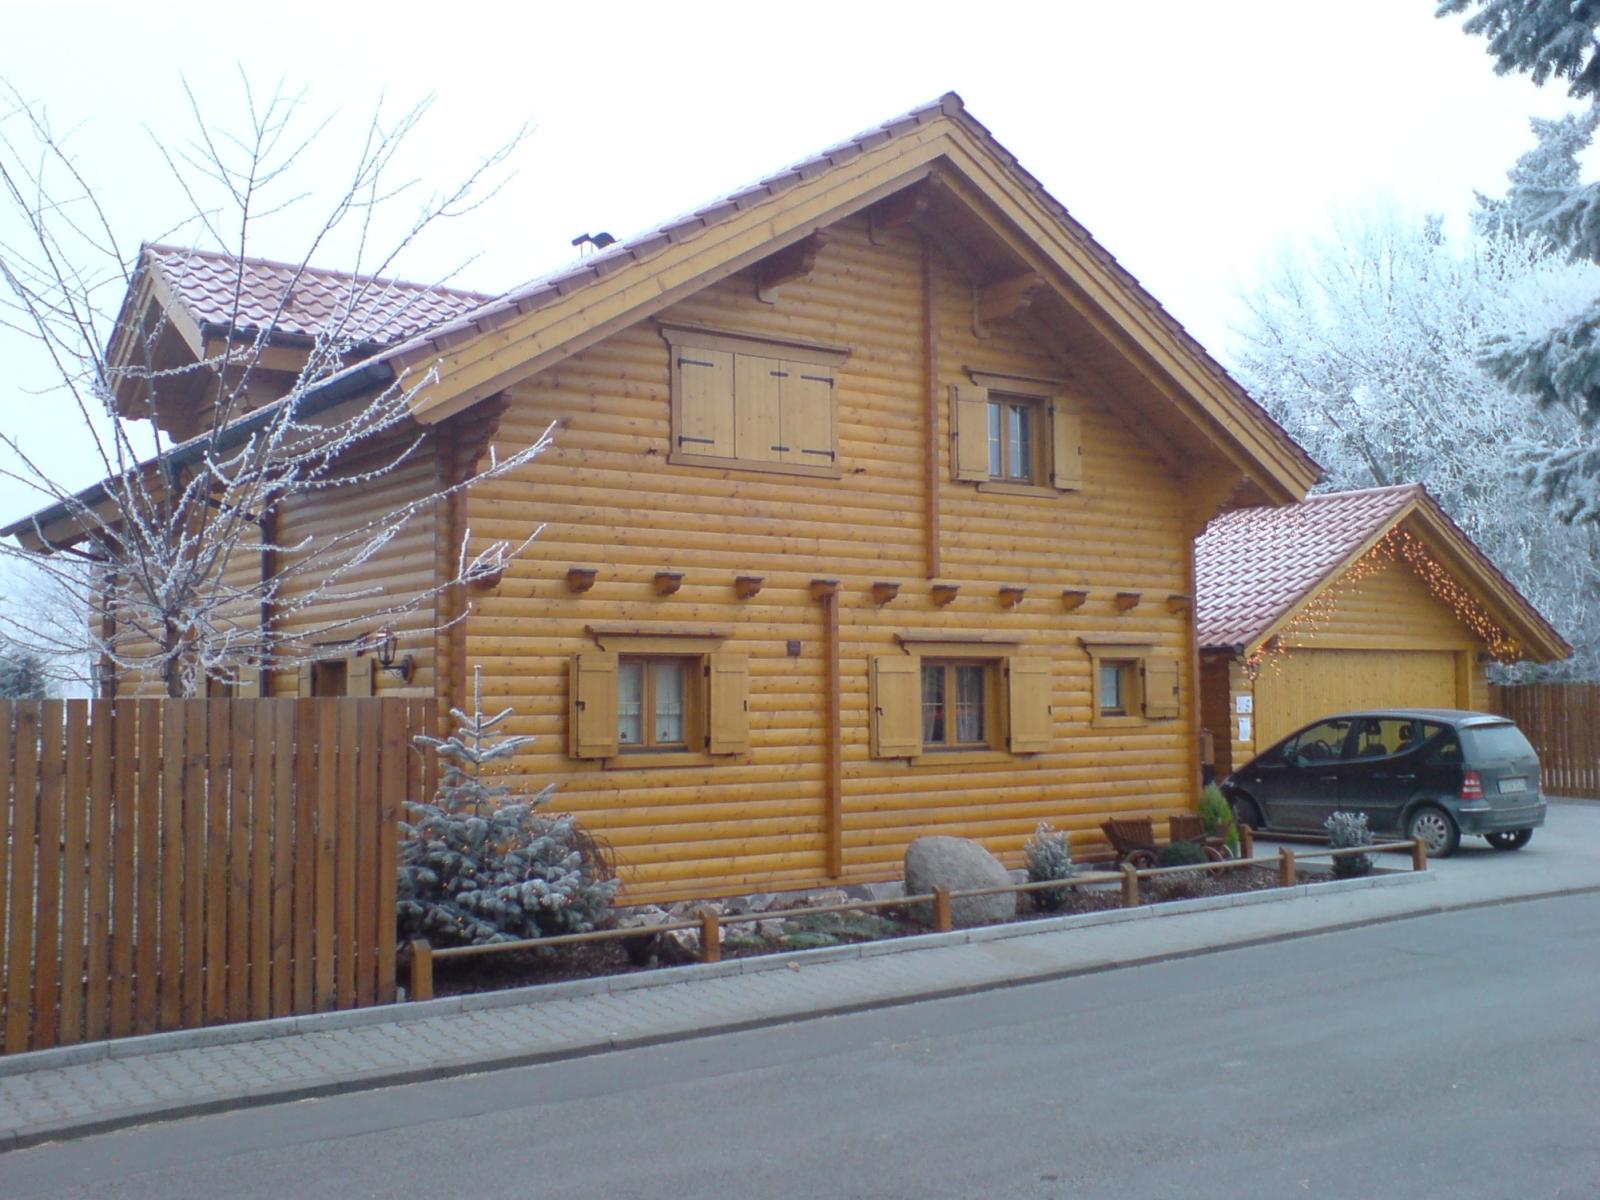 FileModern Timber House Germanyjpg Wikimedia Commons